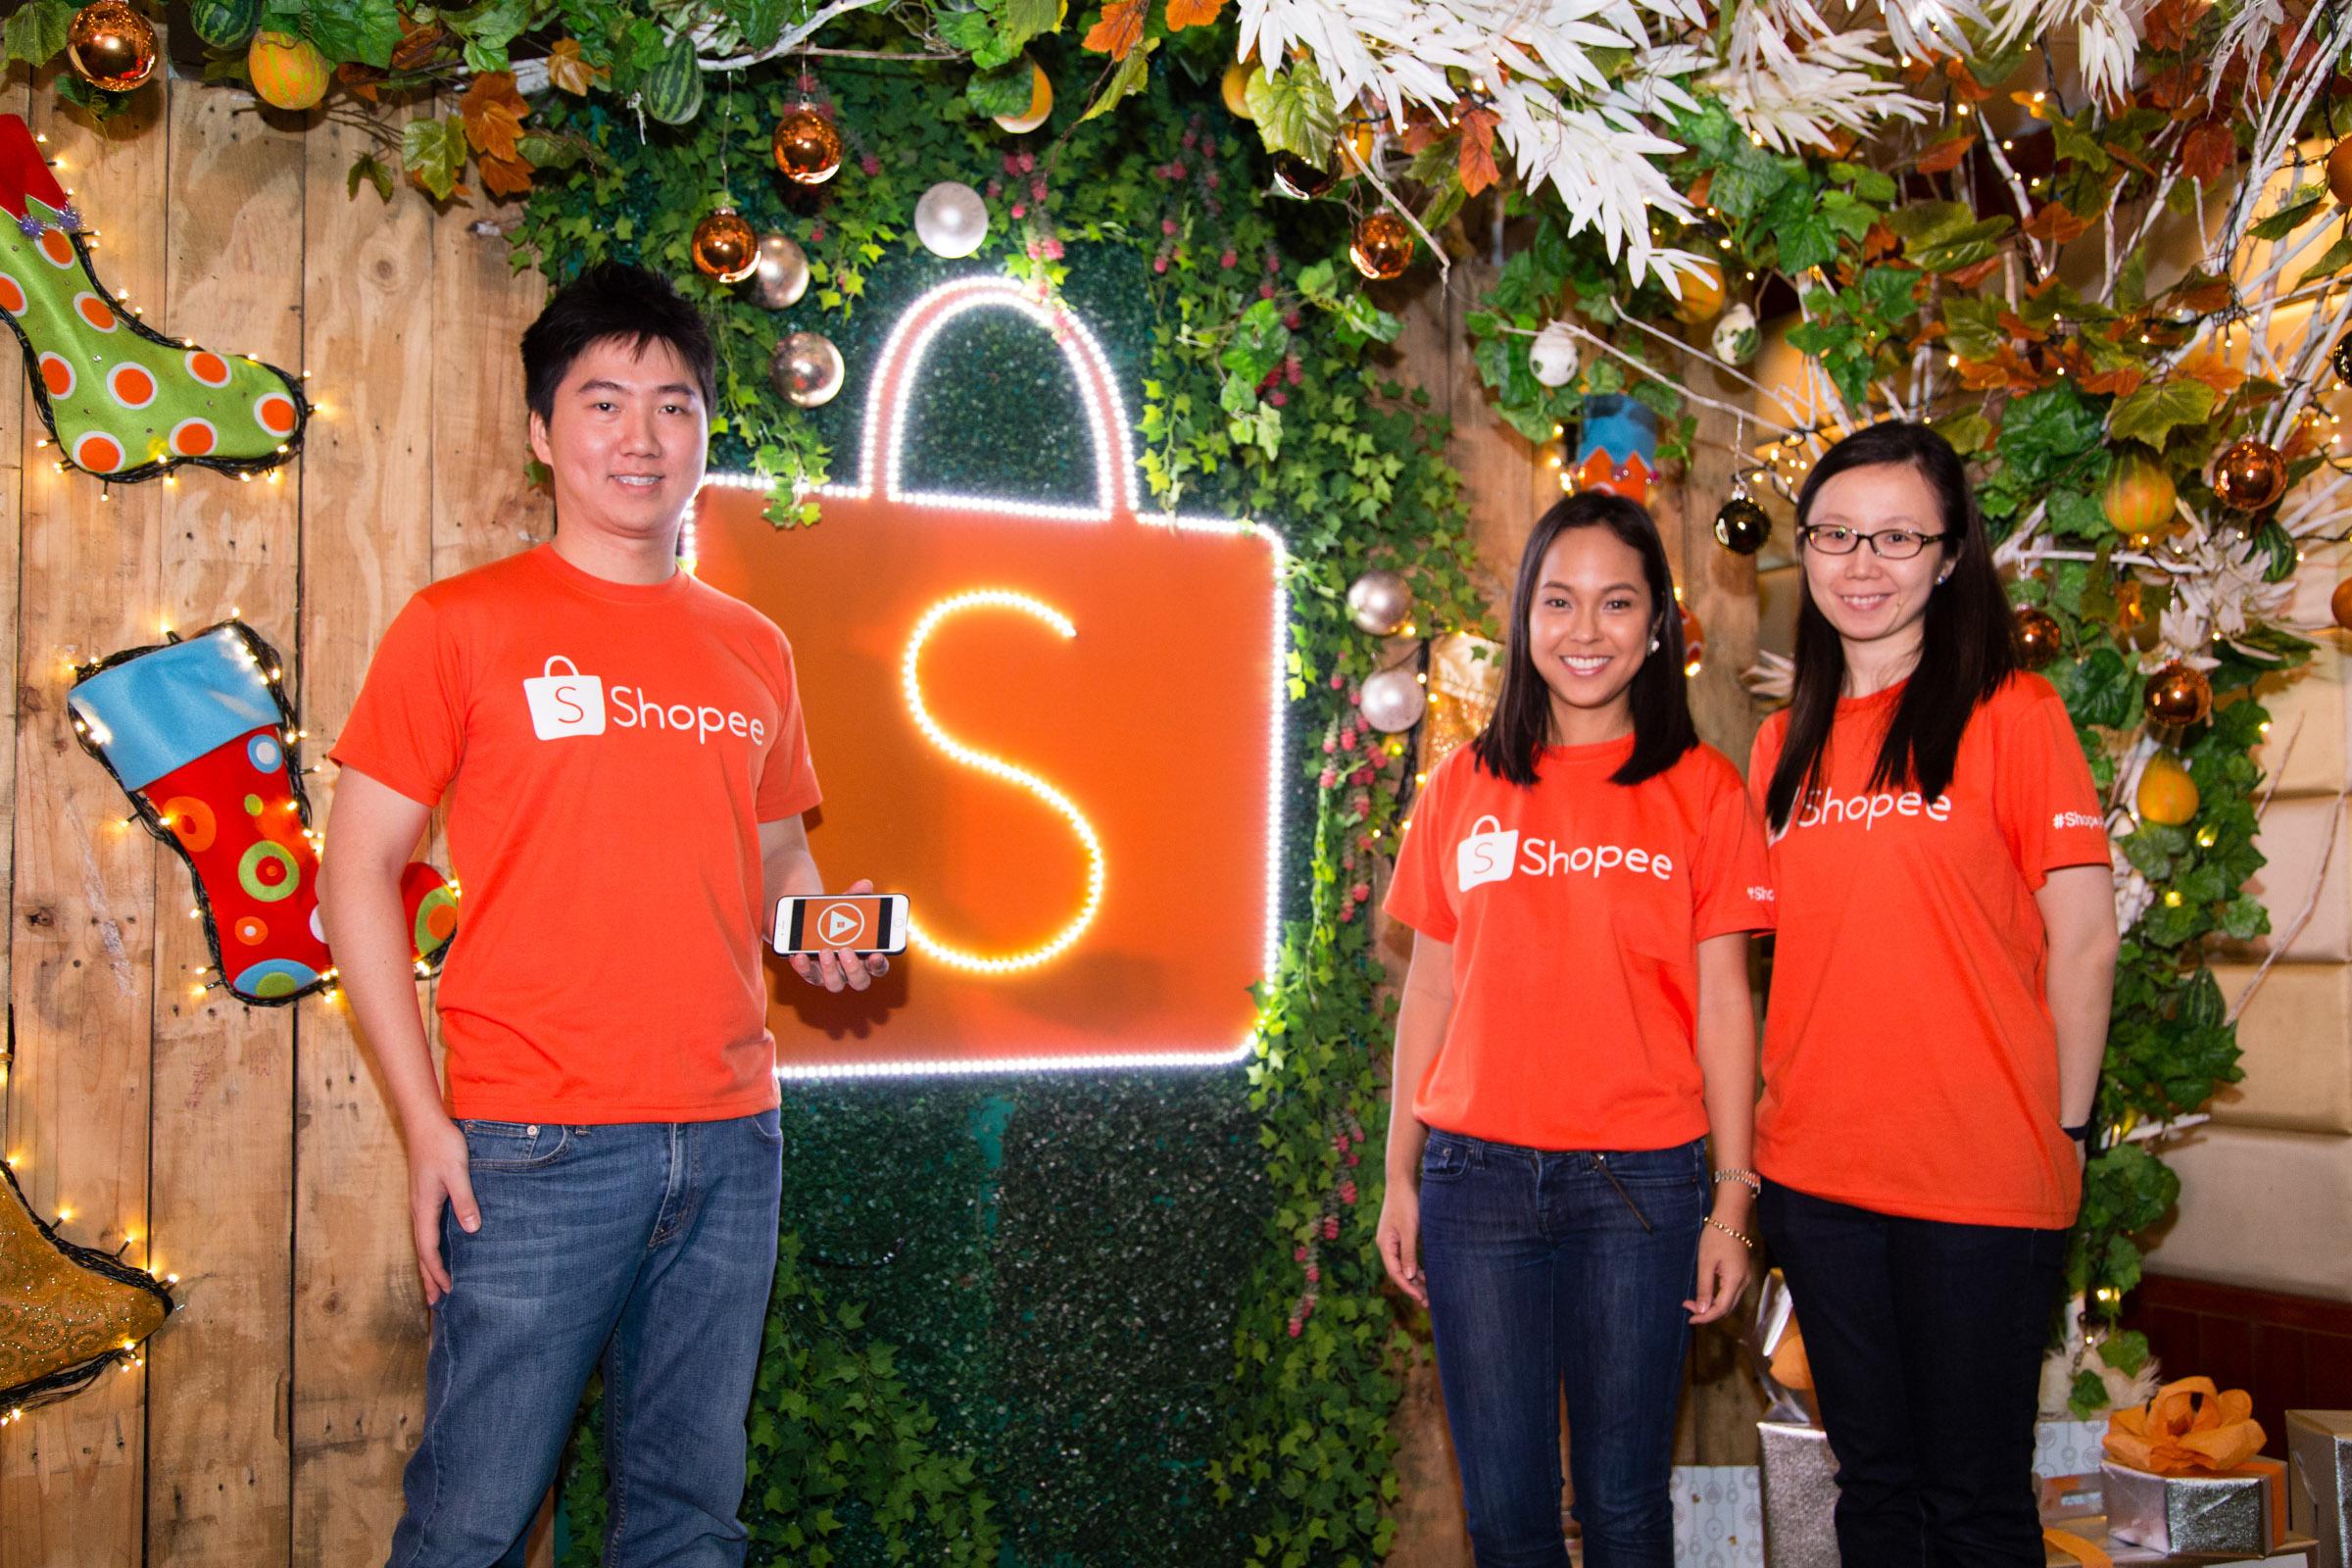 Shopee employer branding